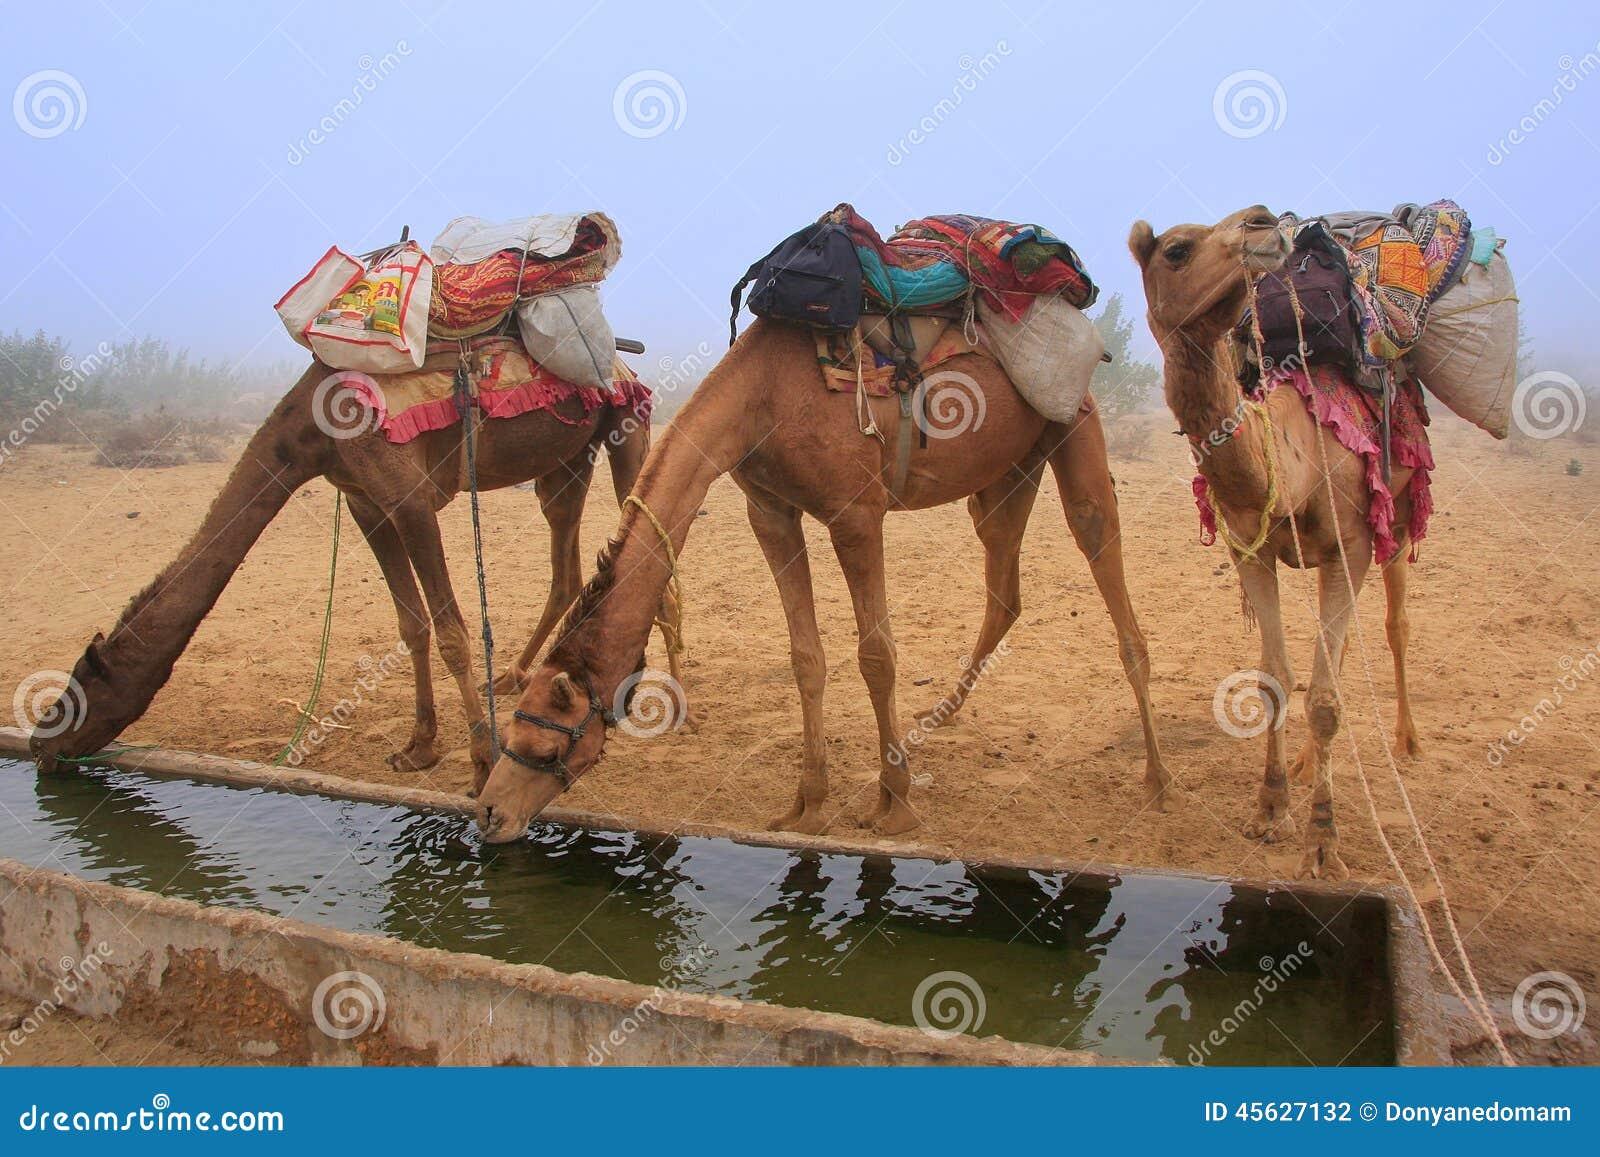 Camels drinking from reservoir in a morning fog during camel safari, Thar desert, Rajasthan, India